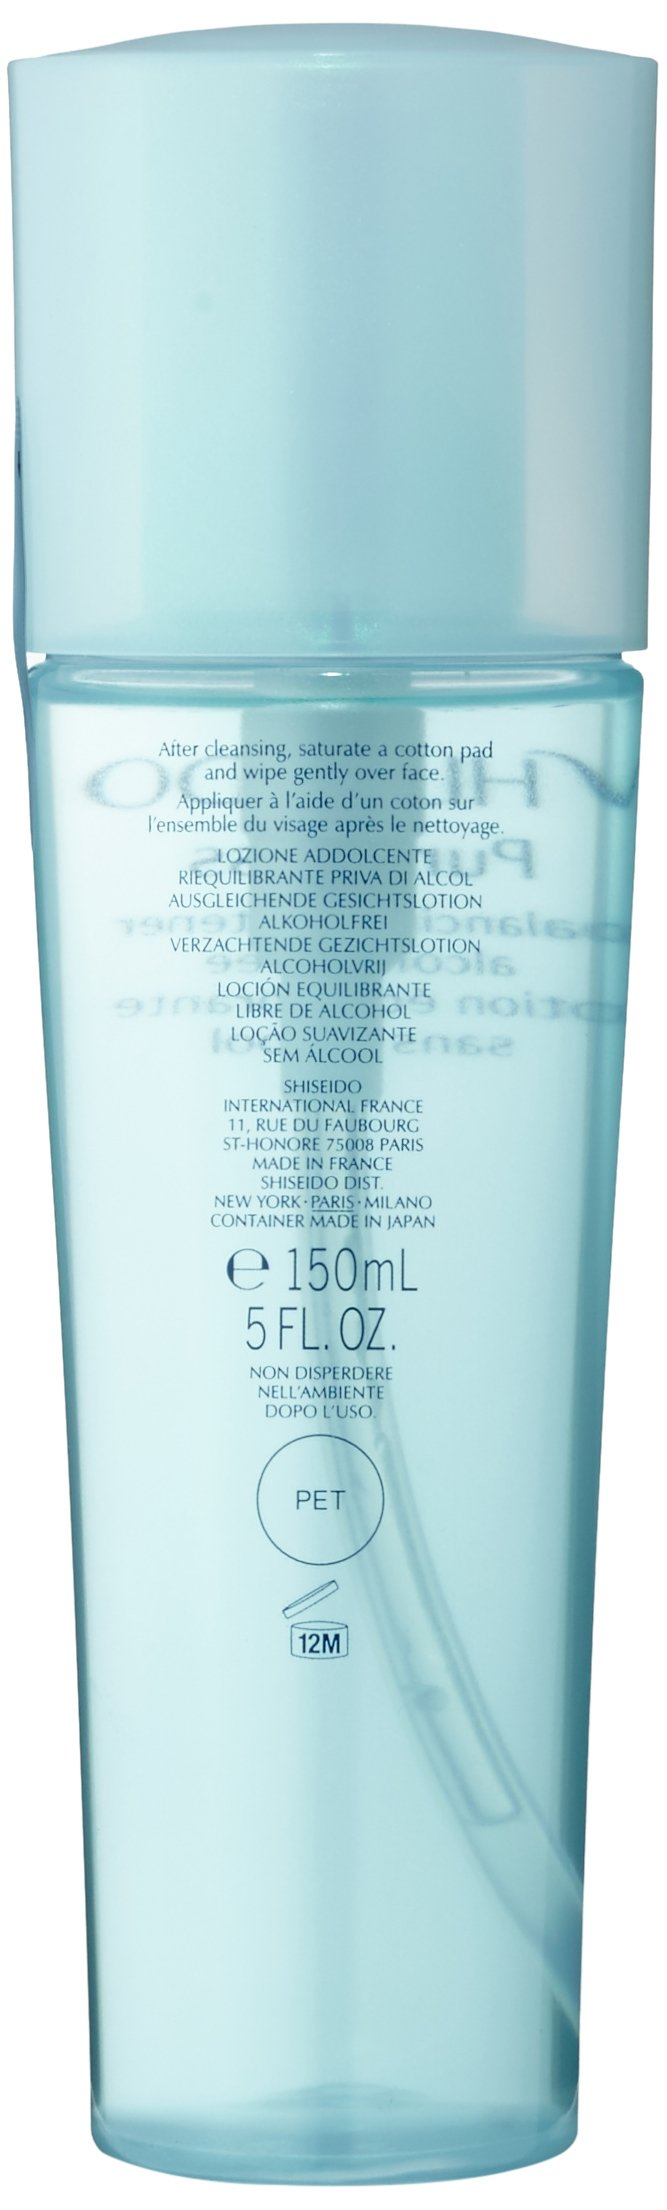 Shiseido Pureness Balancing Softener for Unisex, 5 Ounce by Shiseido (Image #5)